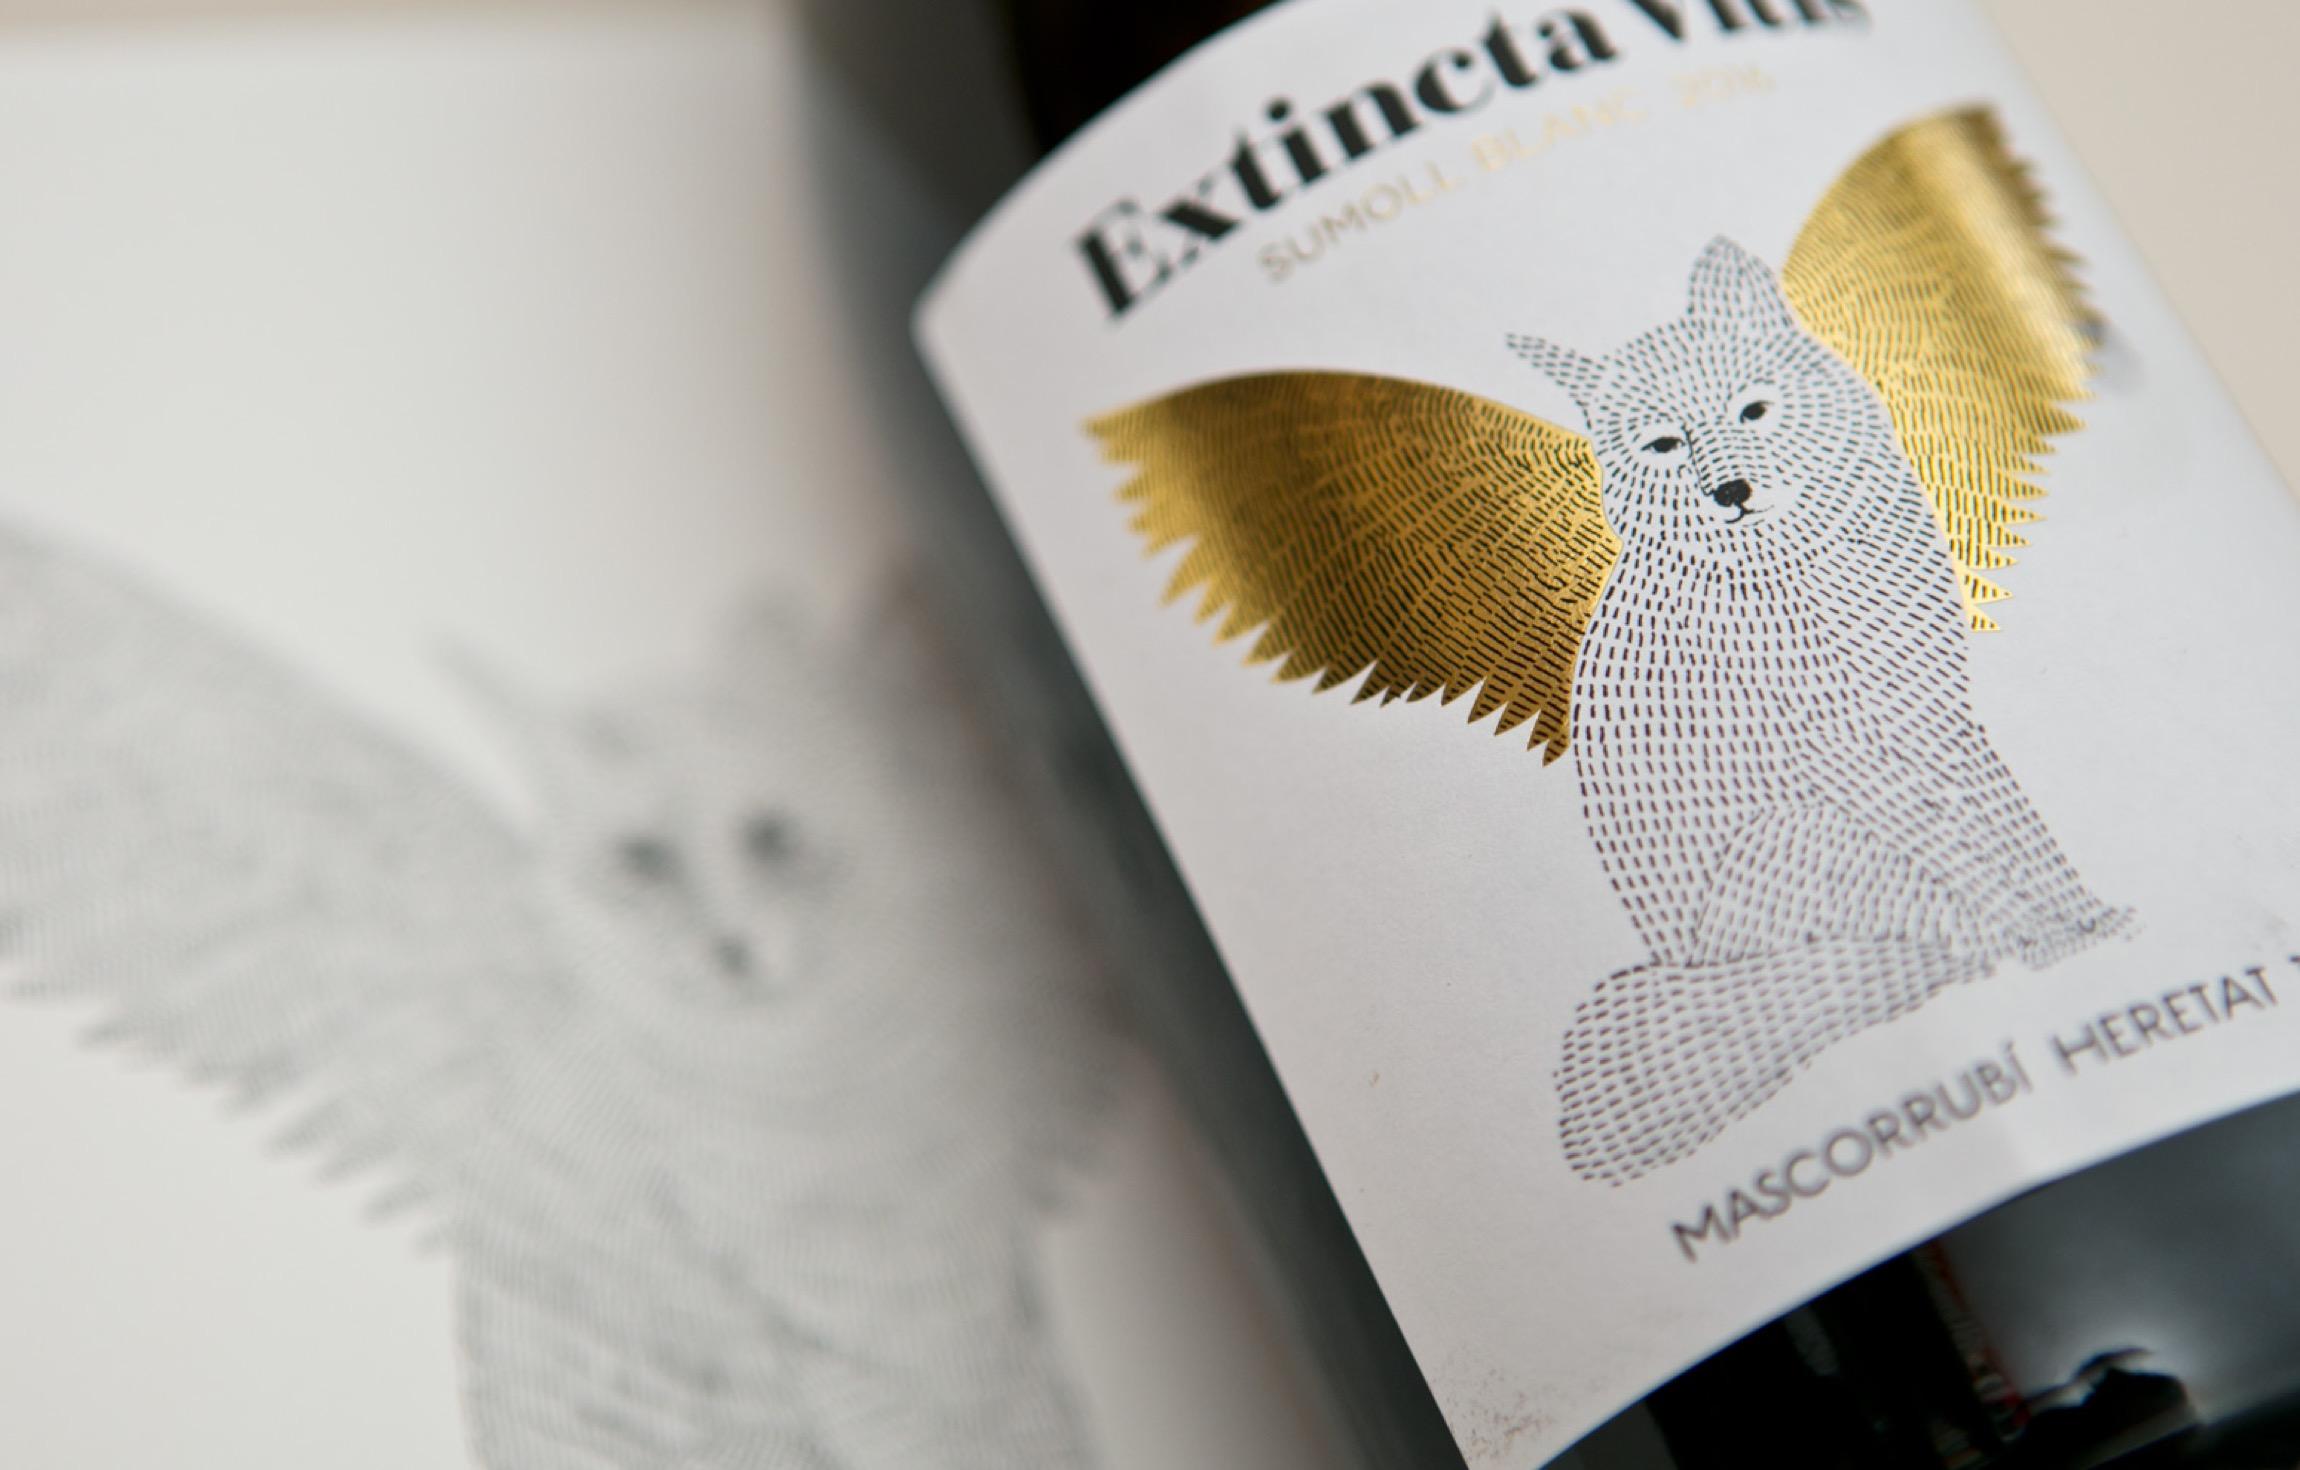 extincta victis - heretat mas corrubi